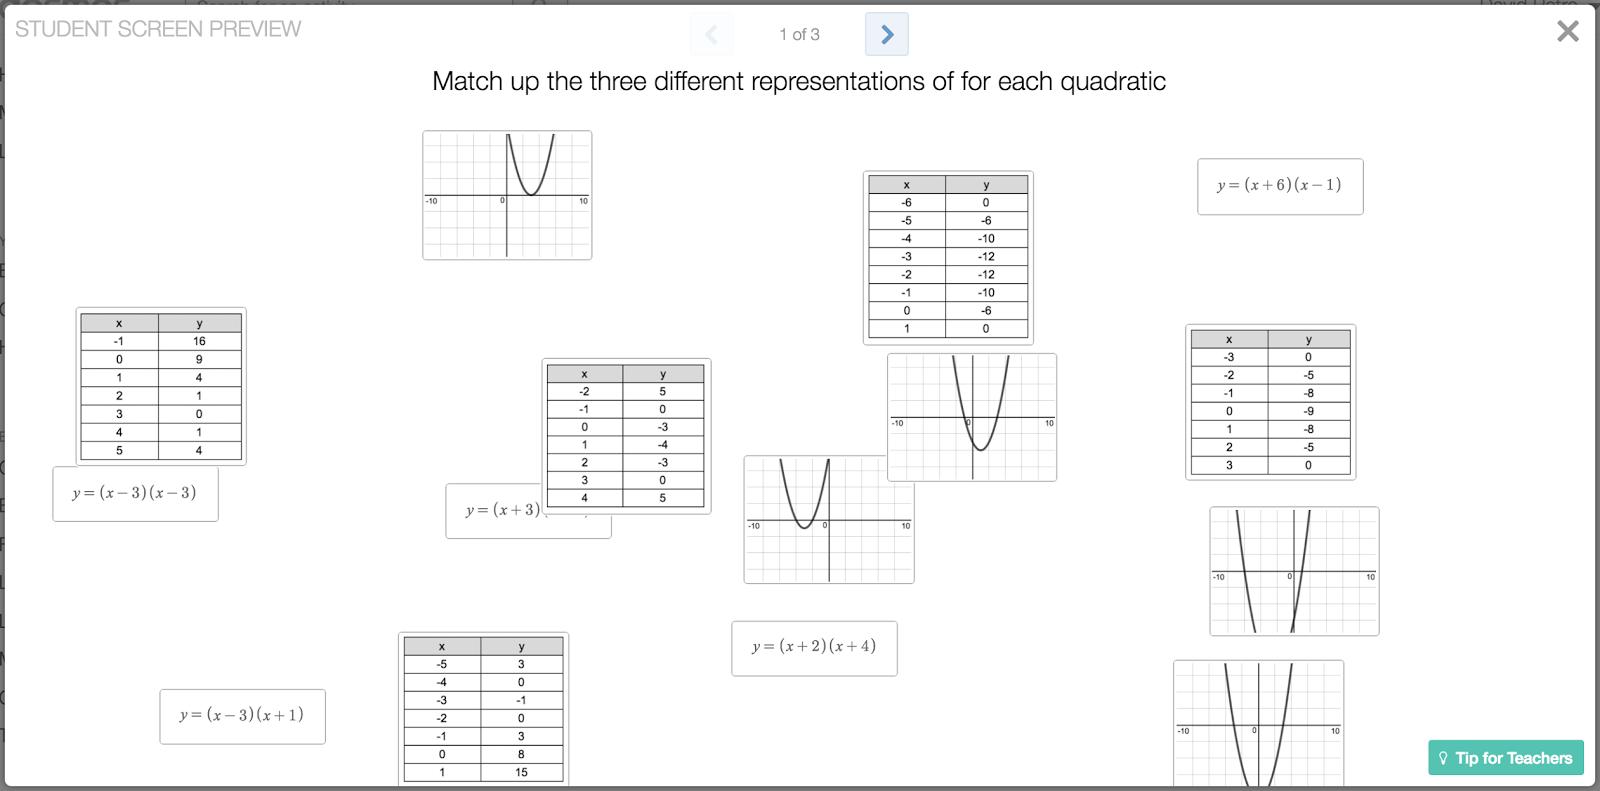 Engaging Math Sort Students Into Groups Using Quadratic Representations